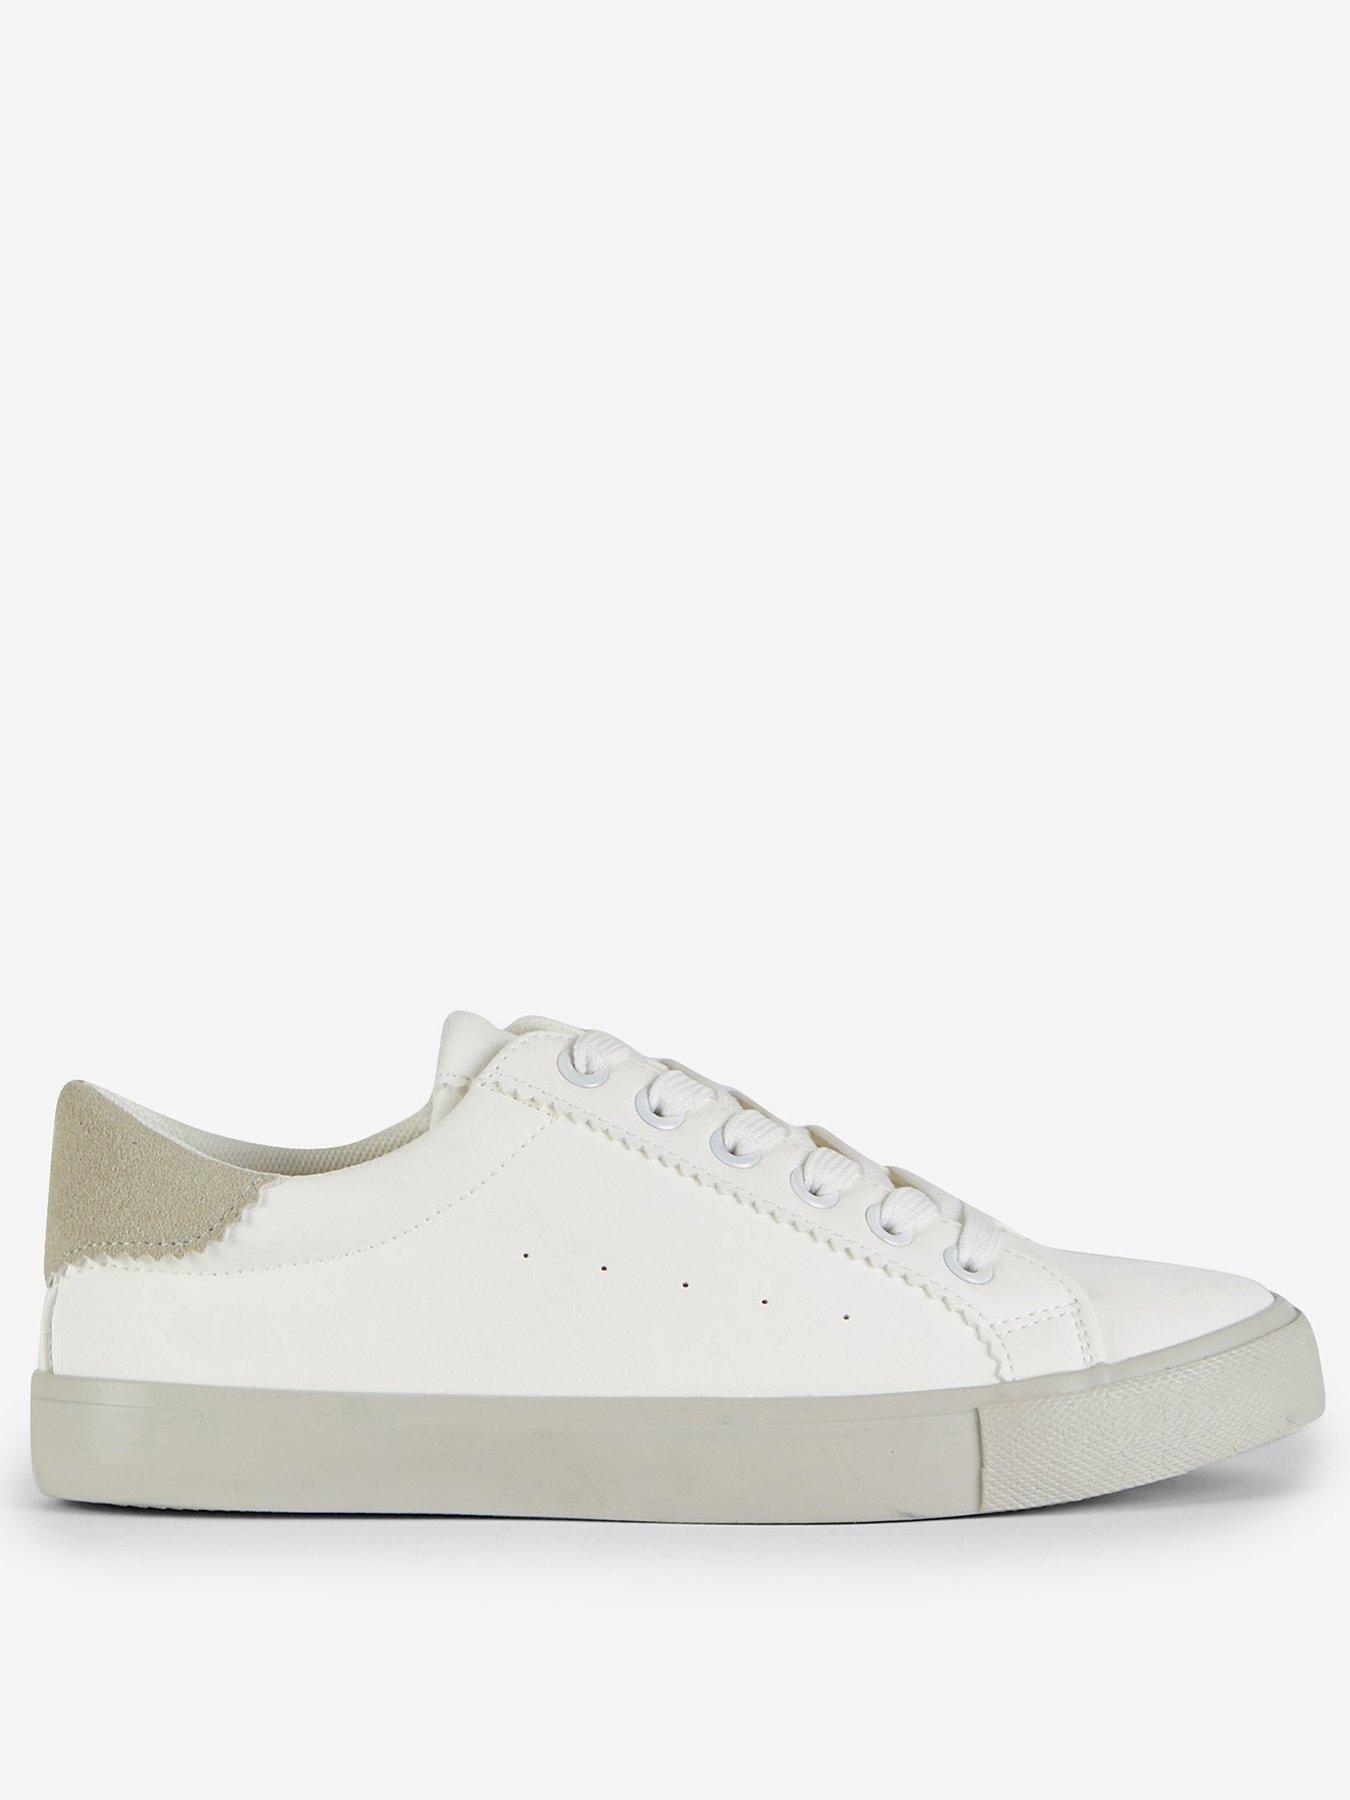 Shoes, Runners \u0026 Trainers   Women